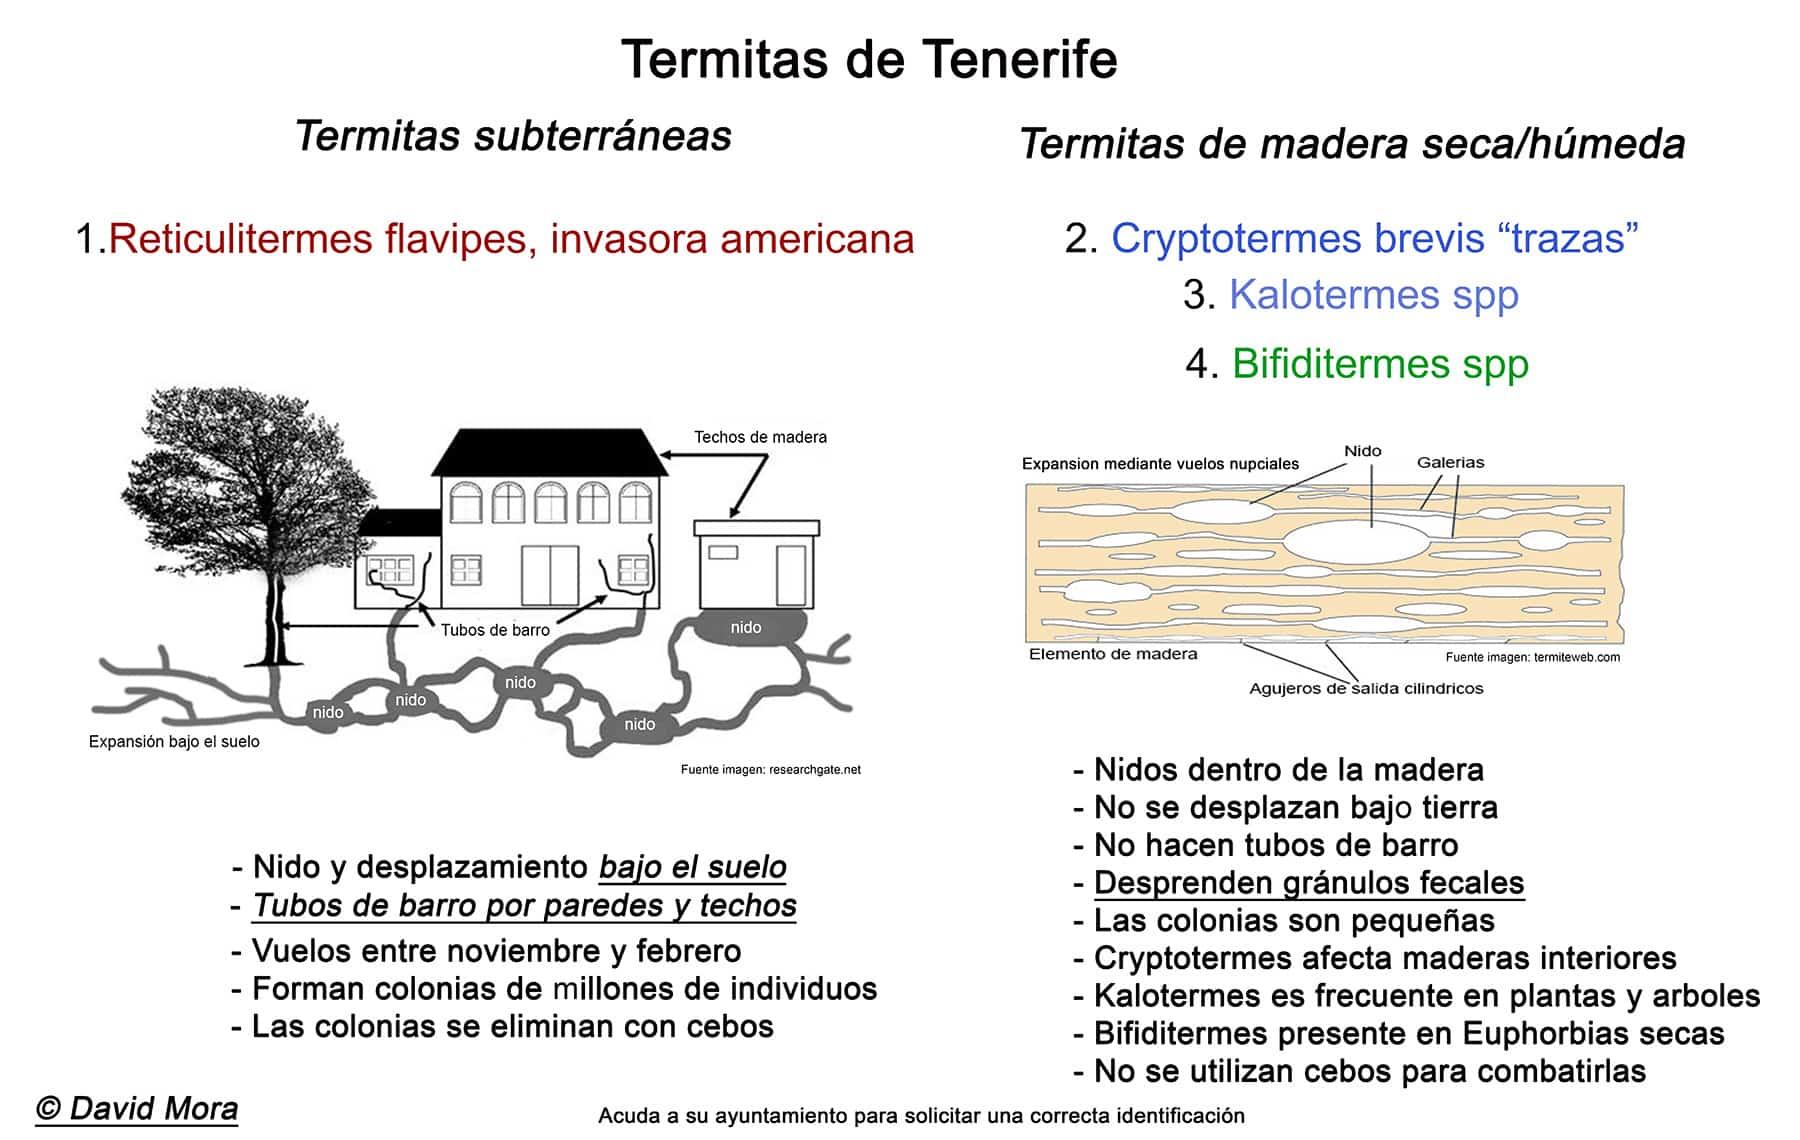 grafico-termitas-tenerife-2